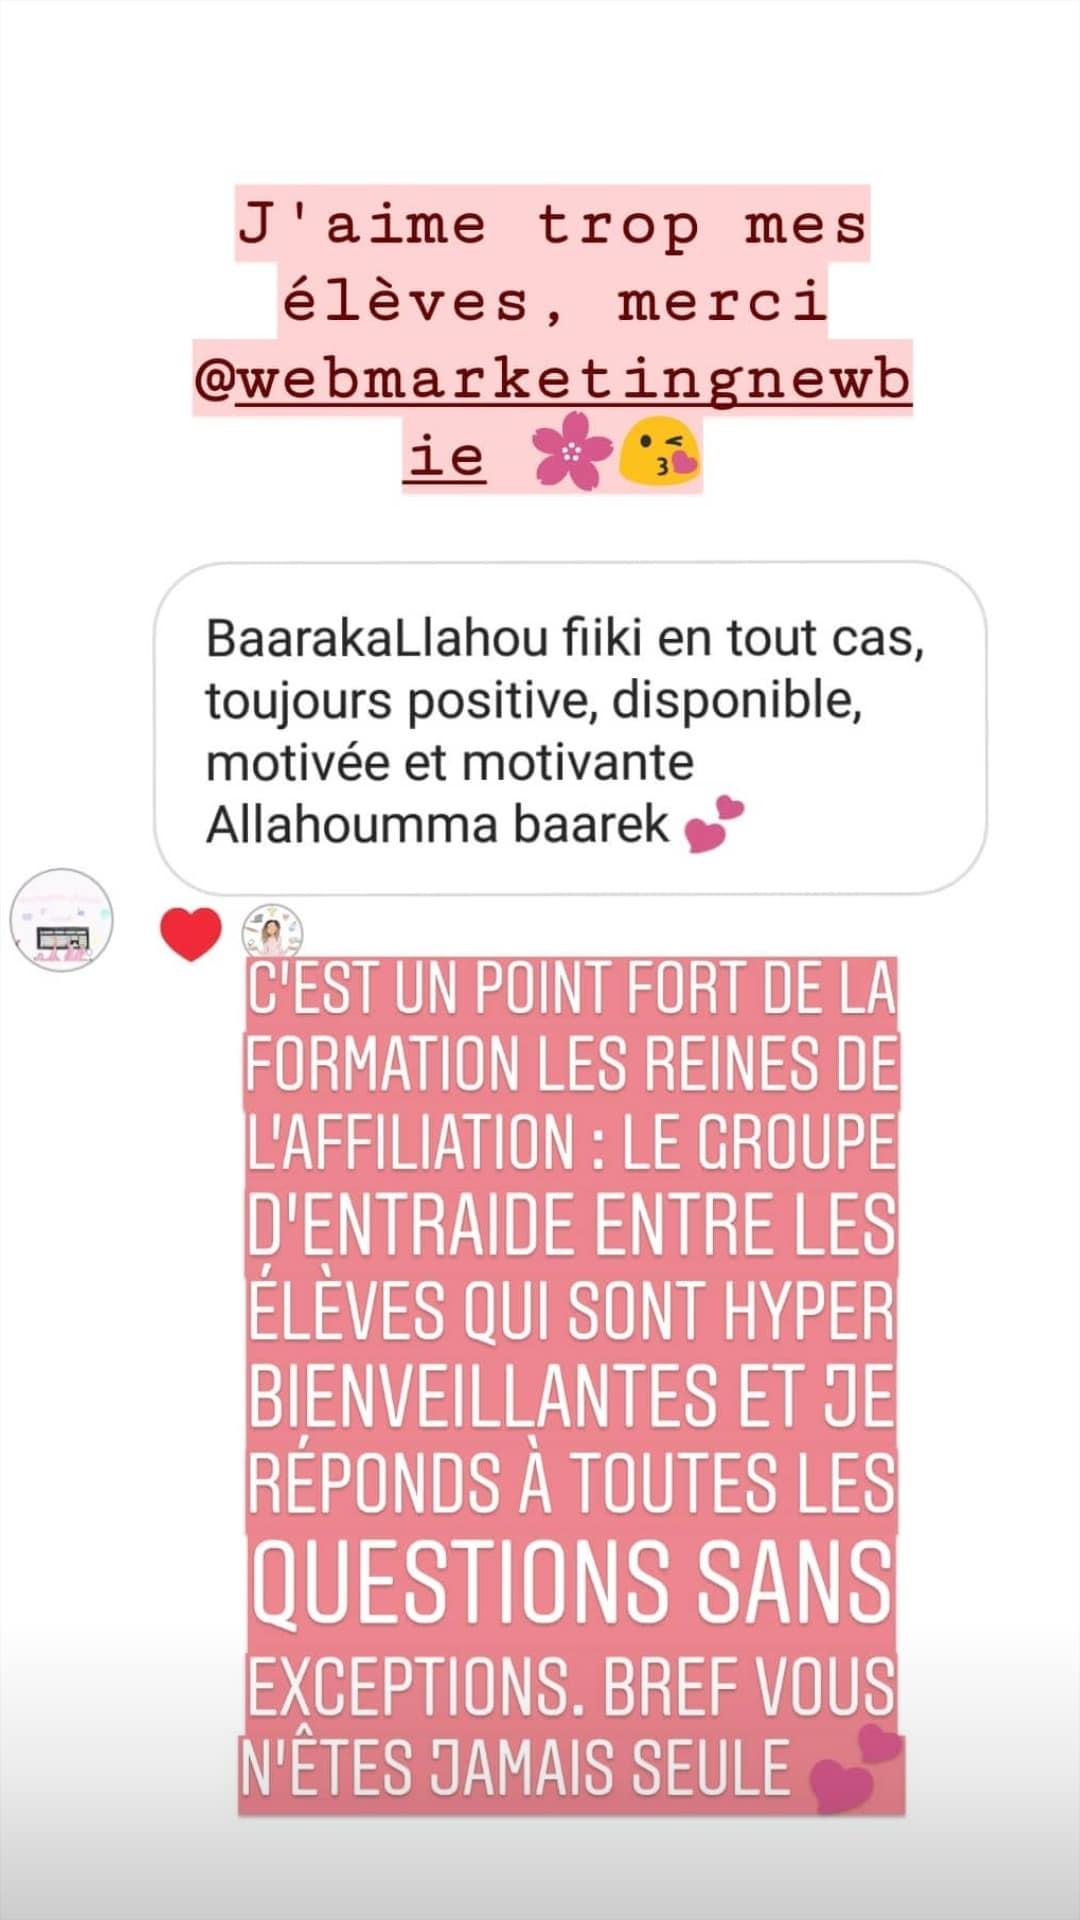 Avis-Les-Reines-Affiliation_20200605_084836